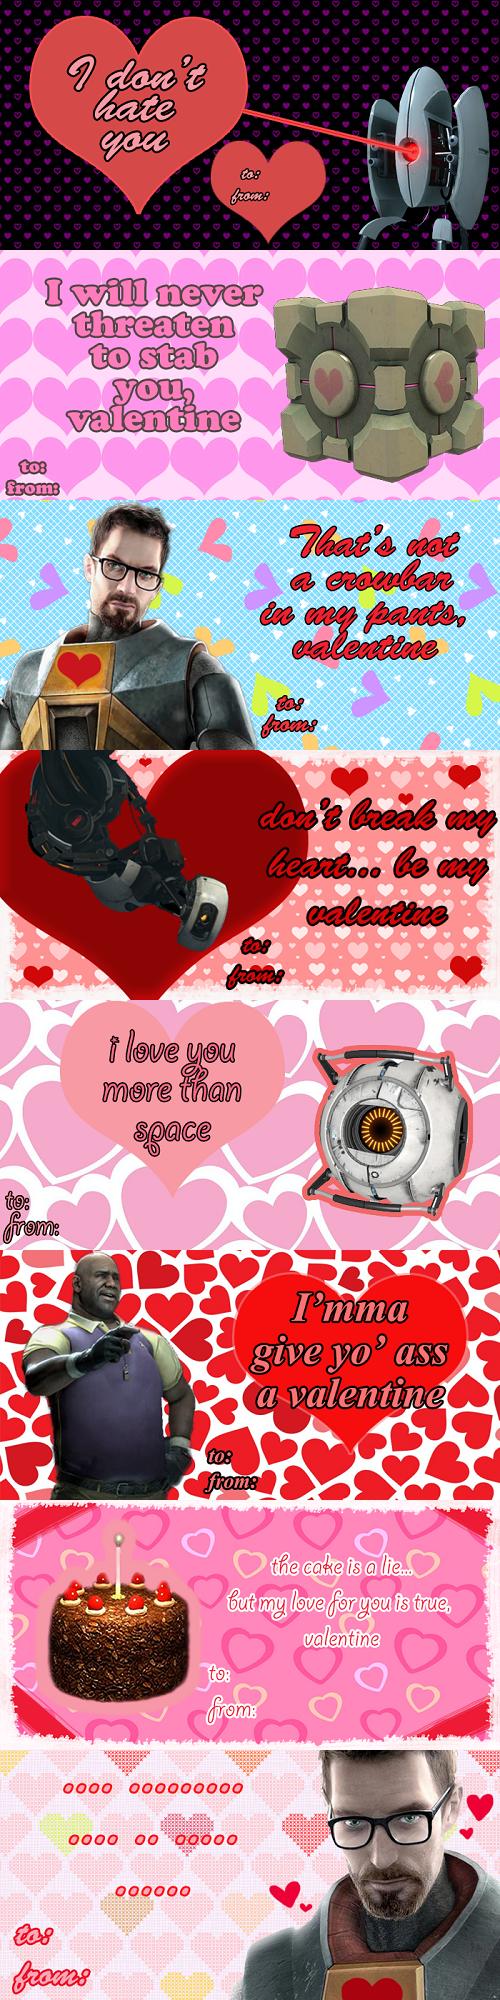 valve Valentines day - 7039109376